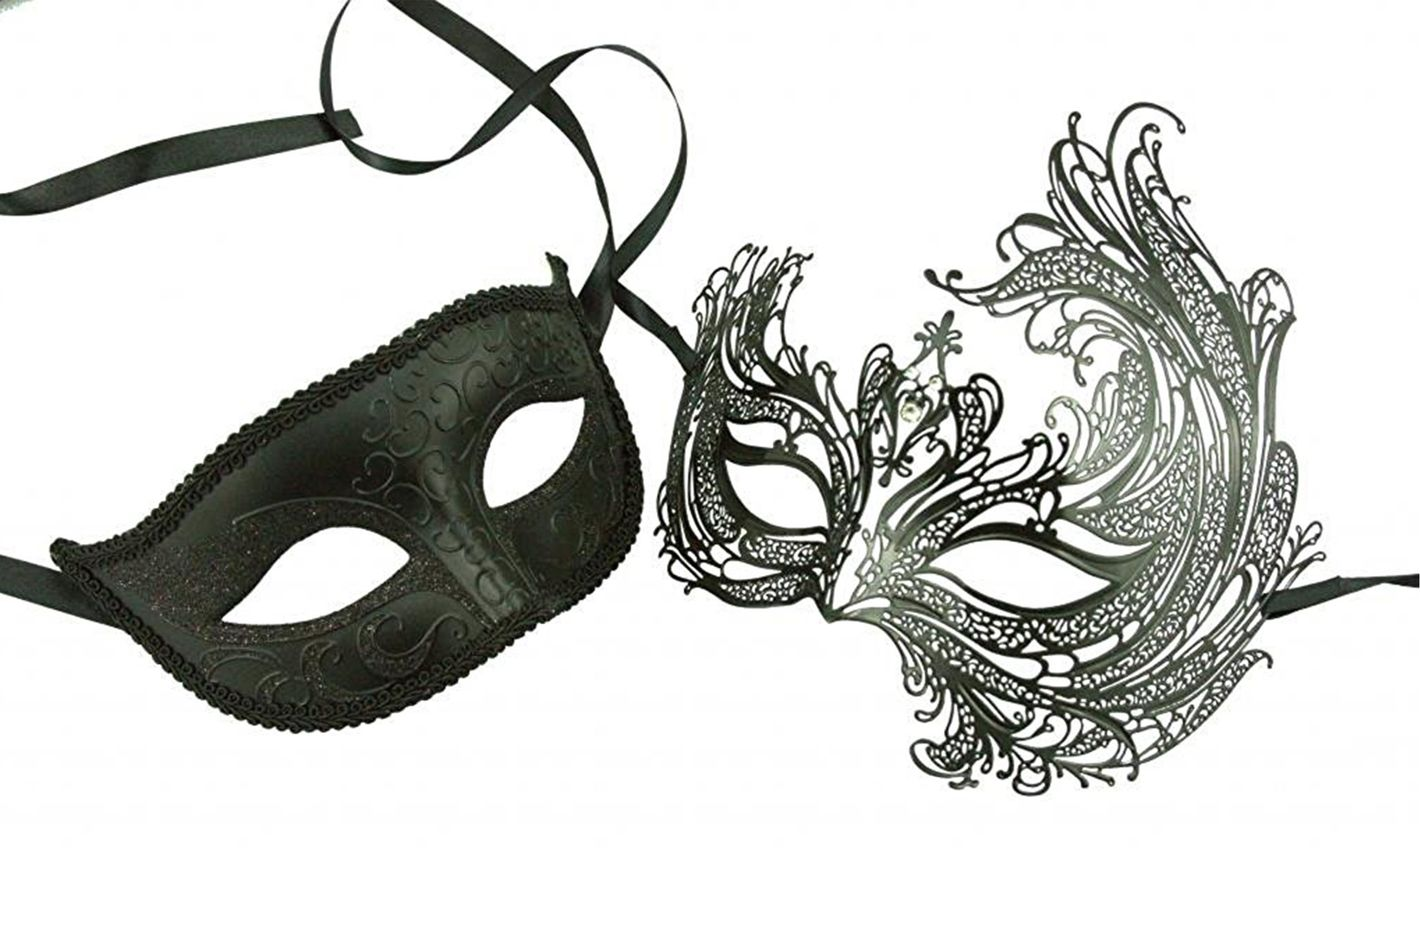 KAYSO INC Original Lover's Collection — Couple's Masquerade Mask Set